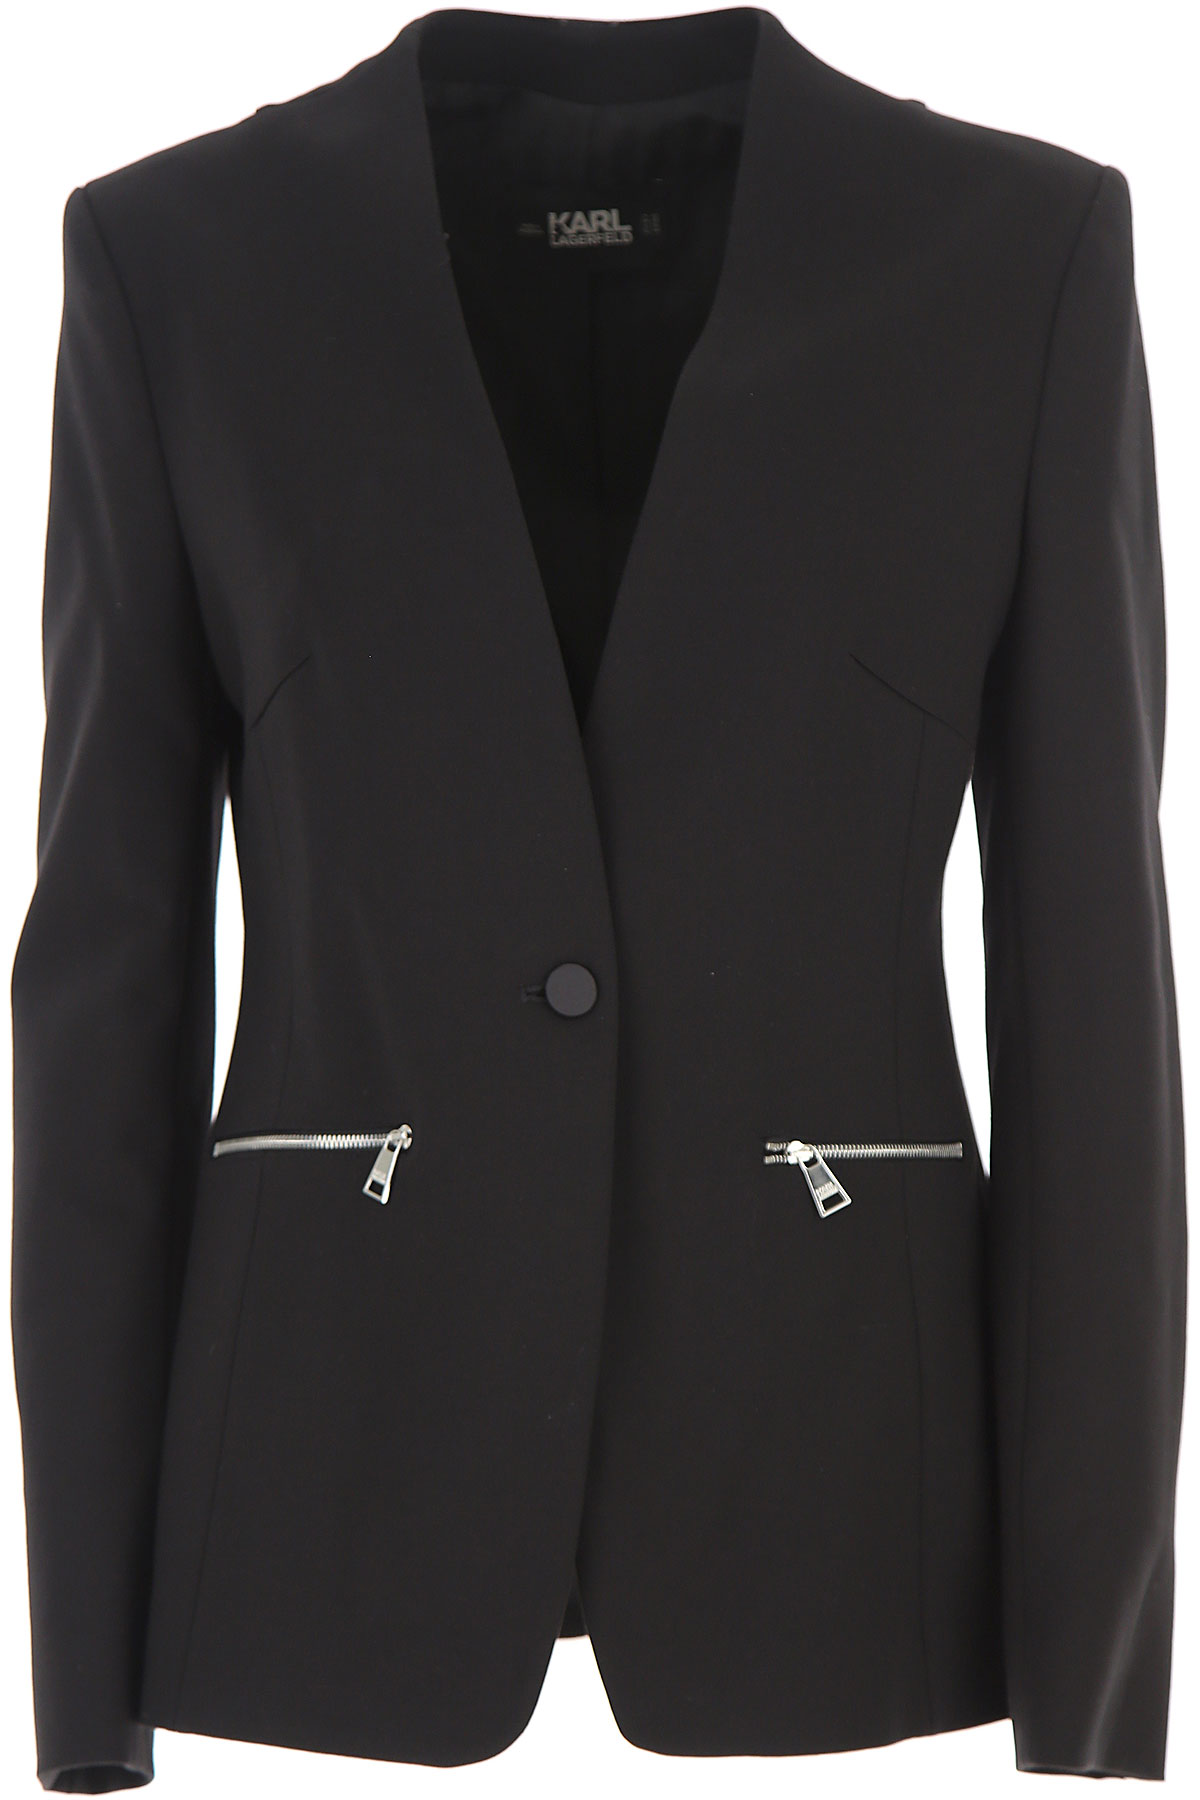 Karl Lagerfeld Blazer for Women On Sale, Black, Viscose, 2019, 4 6